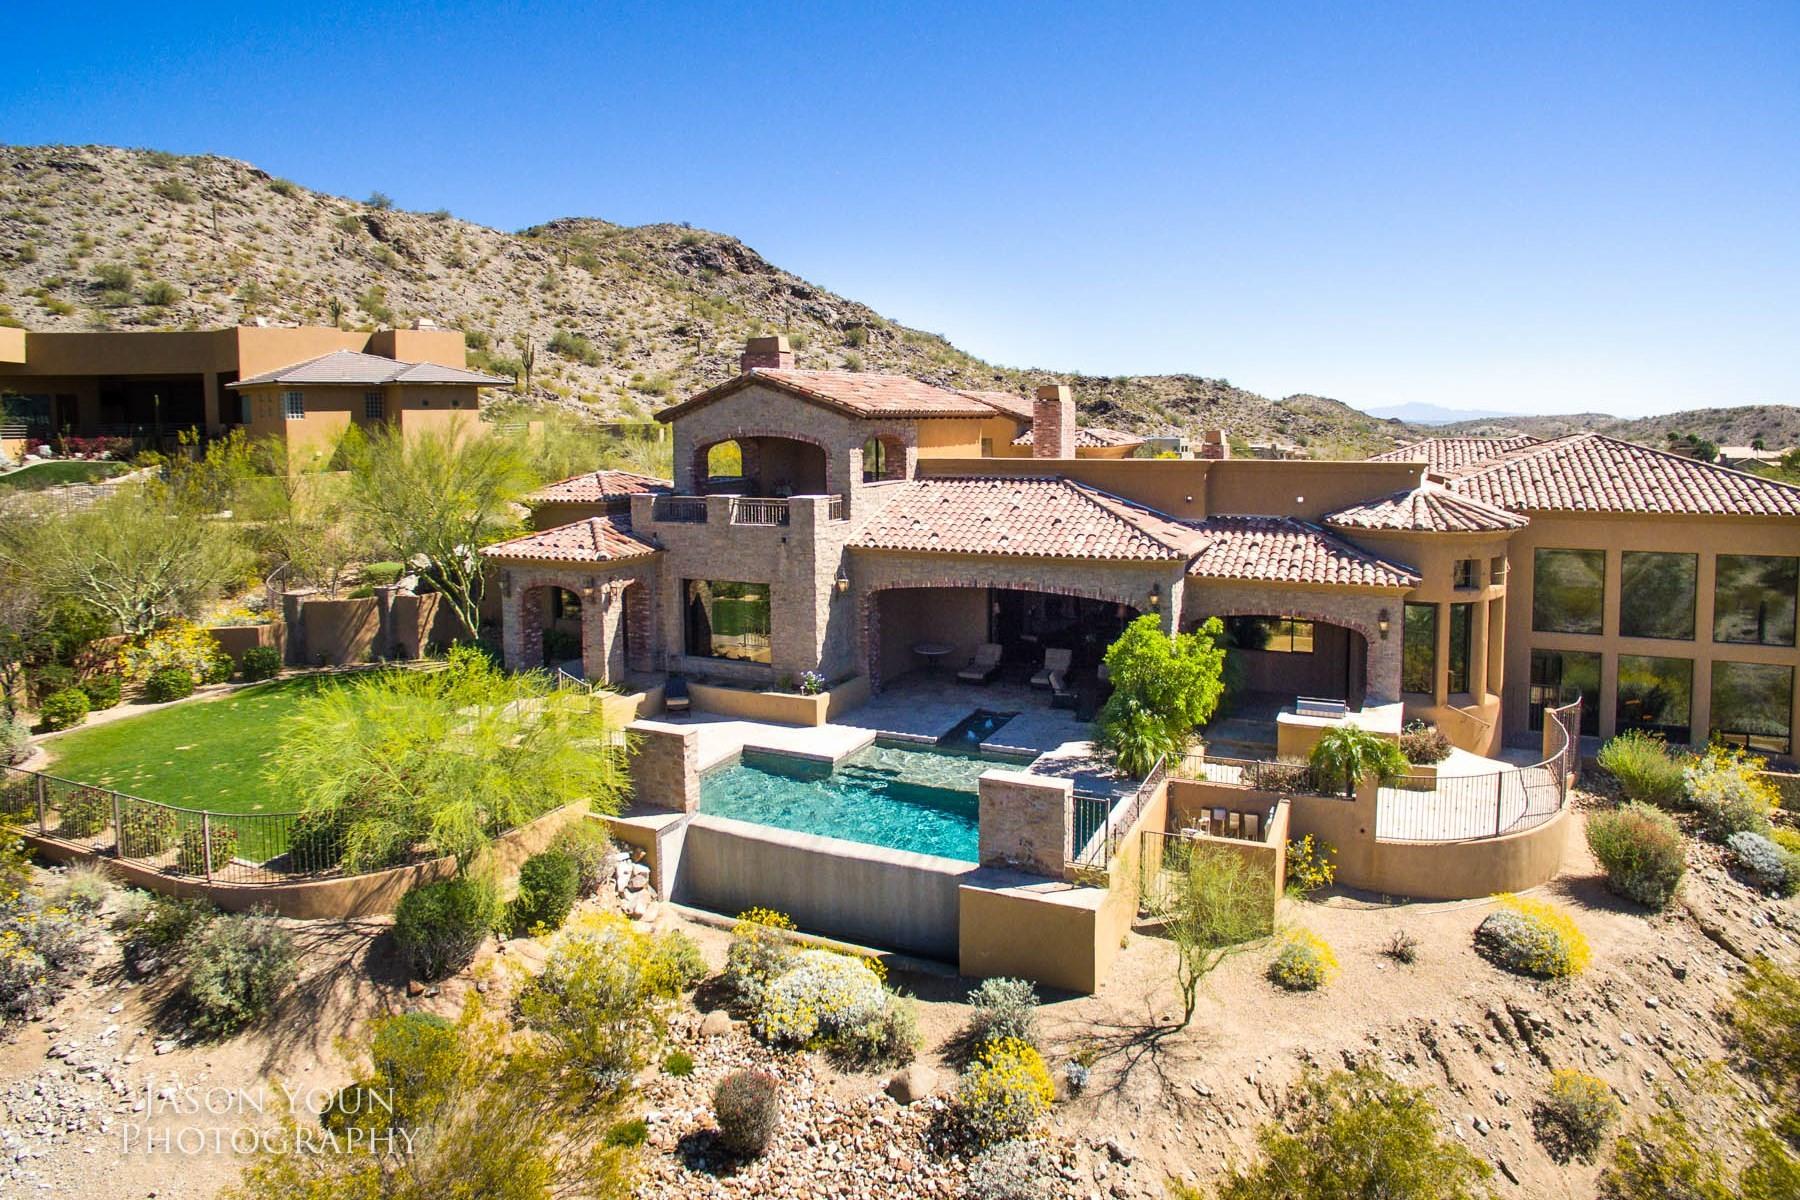 Moradia para Venda às Hilltop custom Tuscan home in the gated community of Canyon Reserve 13808 S Canyon Dr Phoenix, Arizona, 85048 Estados Unidos